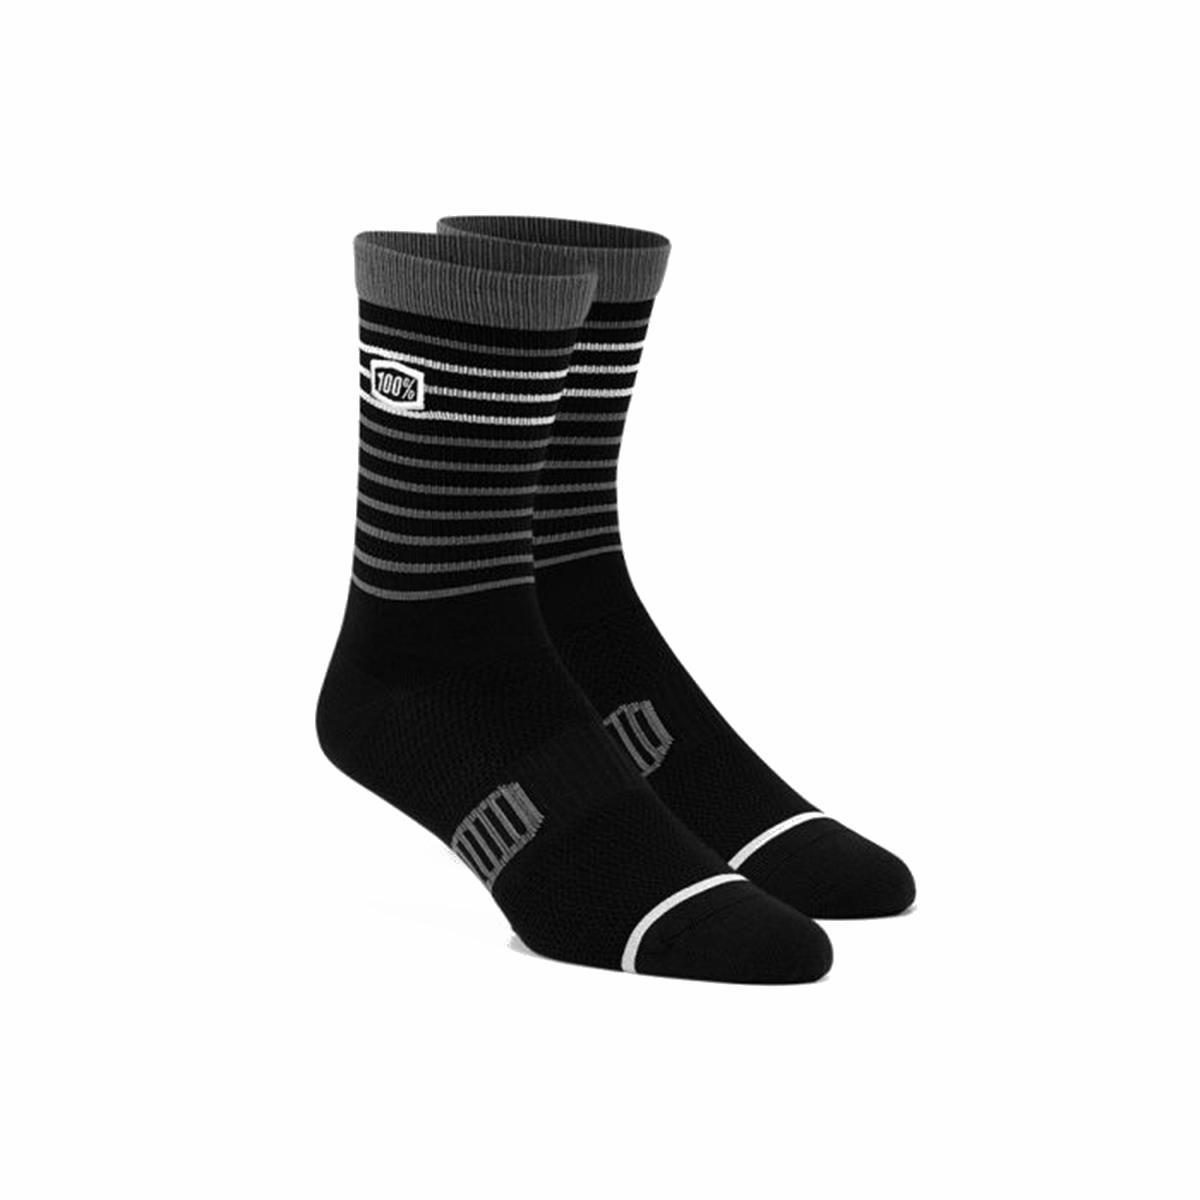 100% Socken Advocate Schwarz